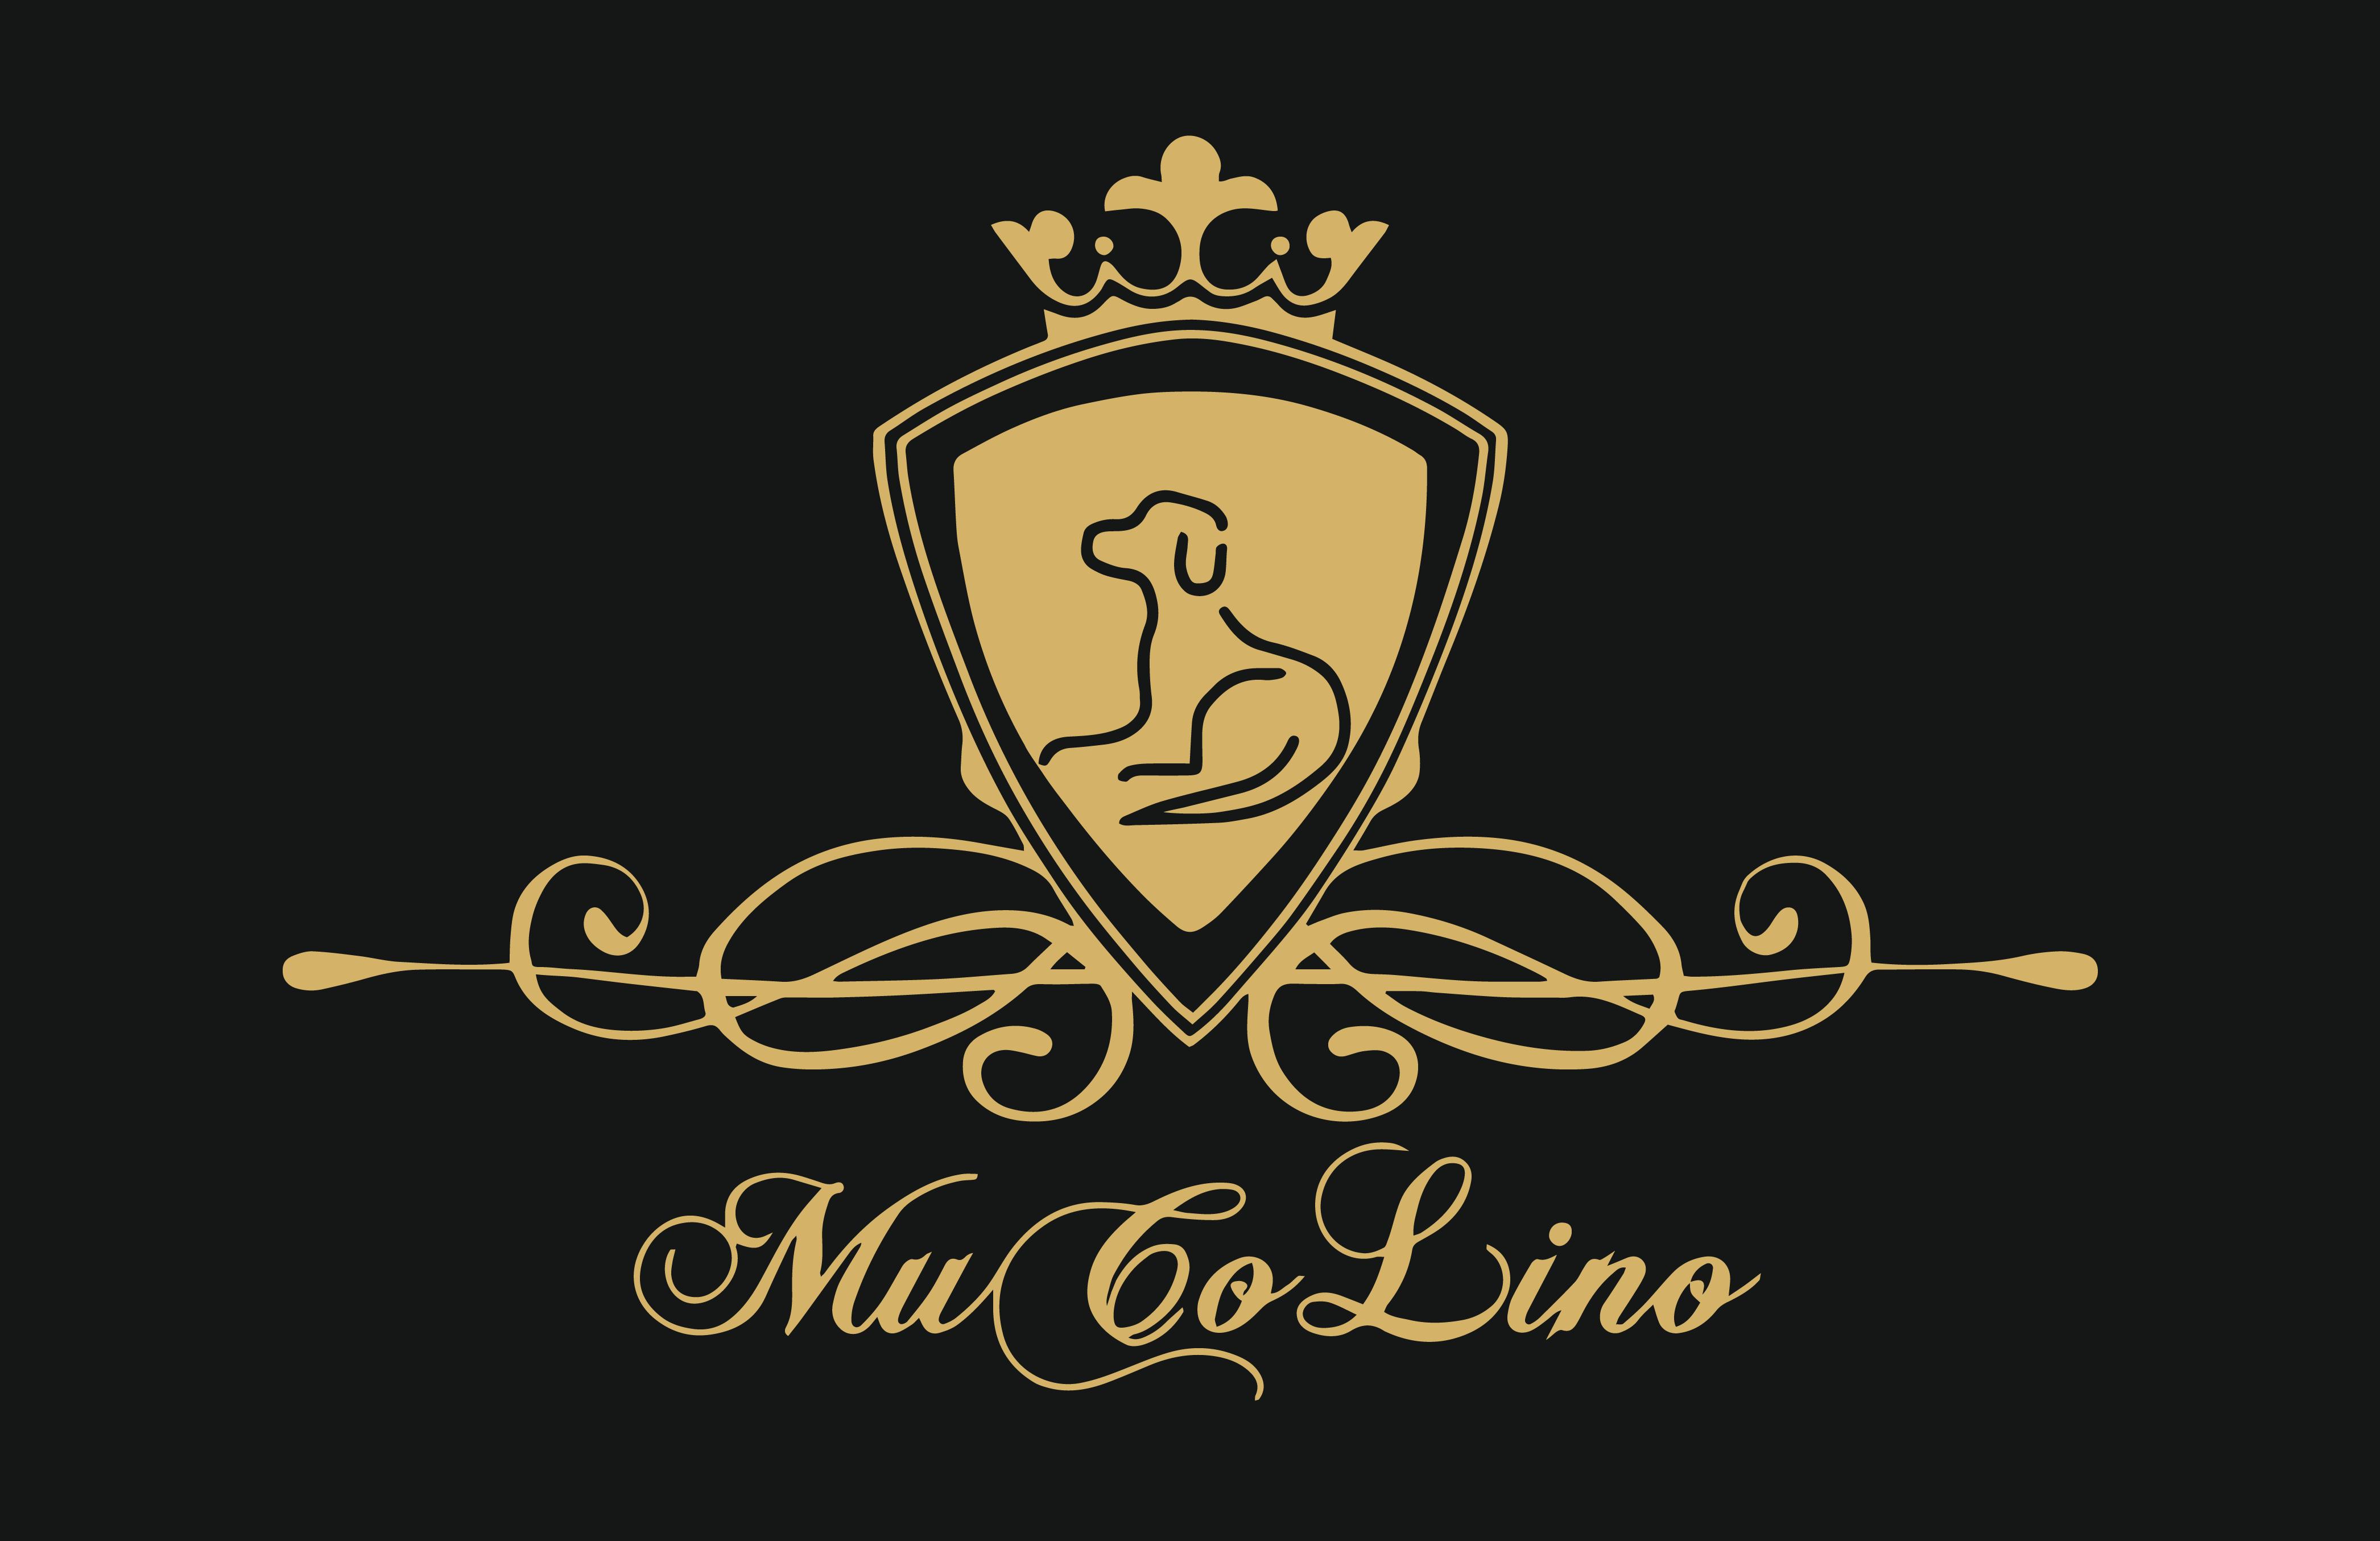 MuCoLino